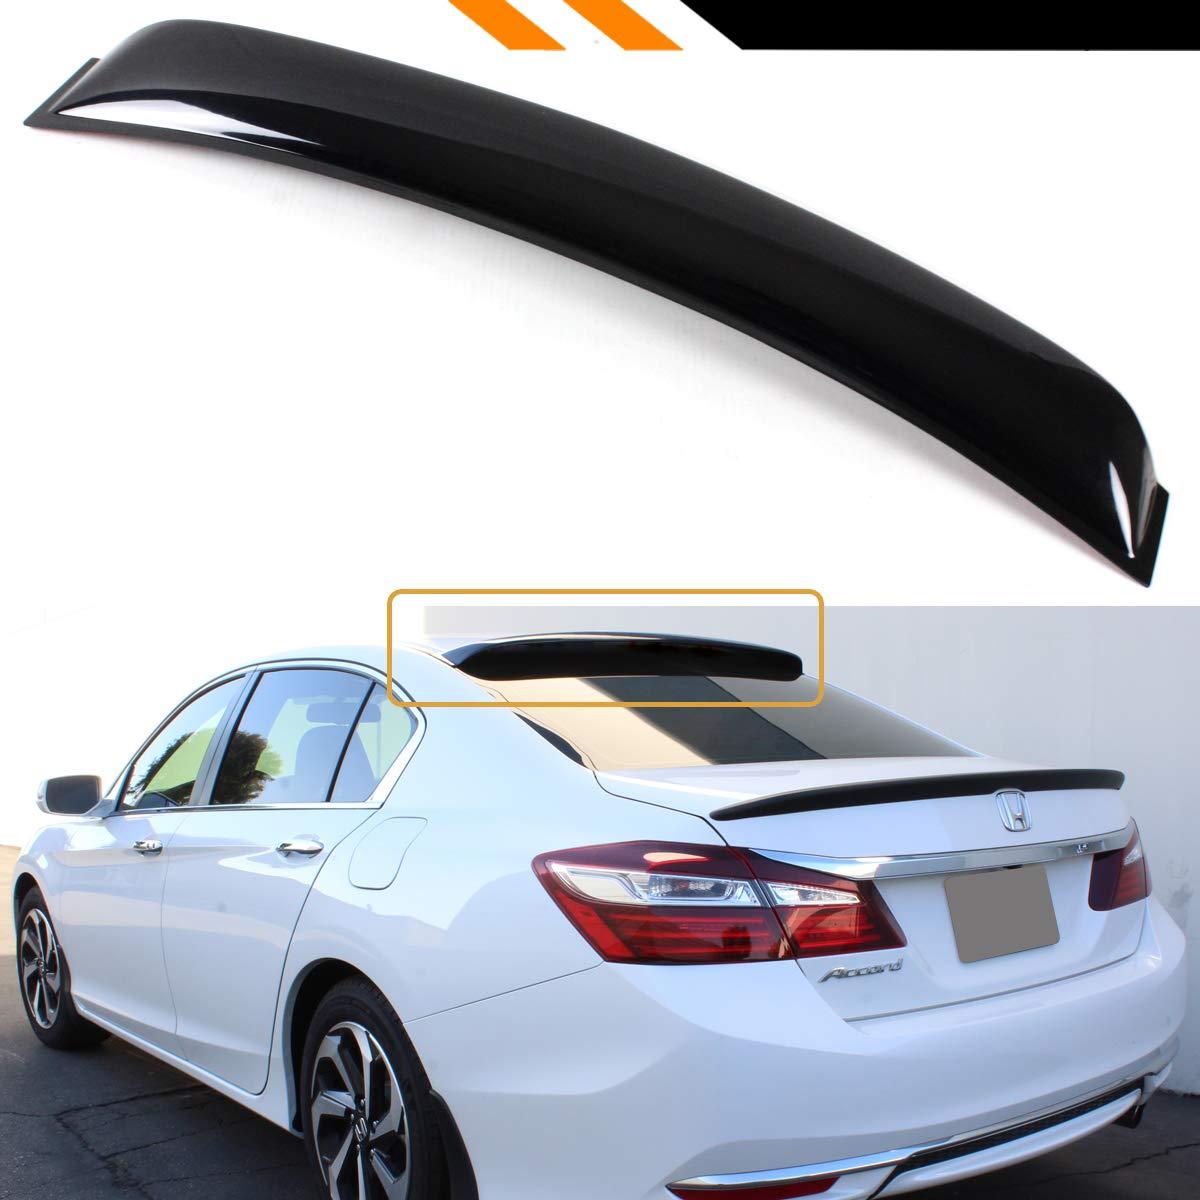 9Th Gen Accord >> Cuztom Tuning Fits For 2013 2017 9th Gen Honda Accord 4 Door Sedan Jdm Rear Window Roof Visor Spoiler Deflector